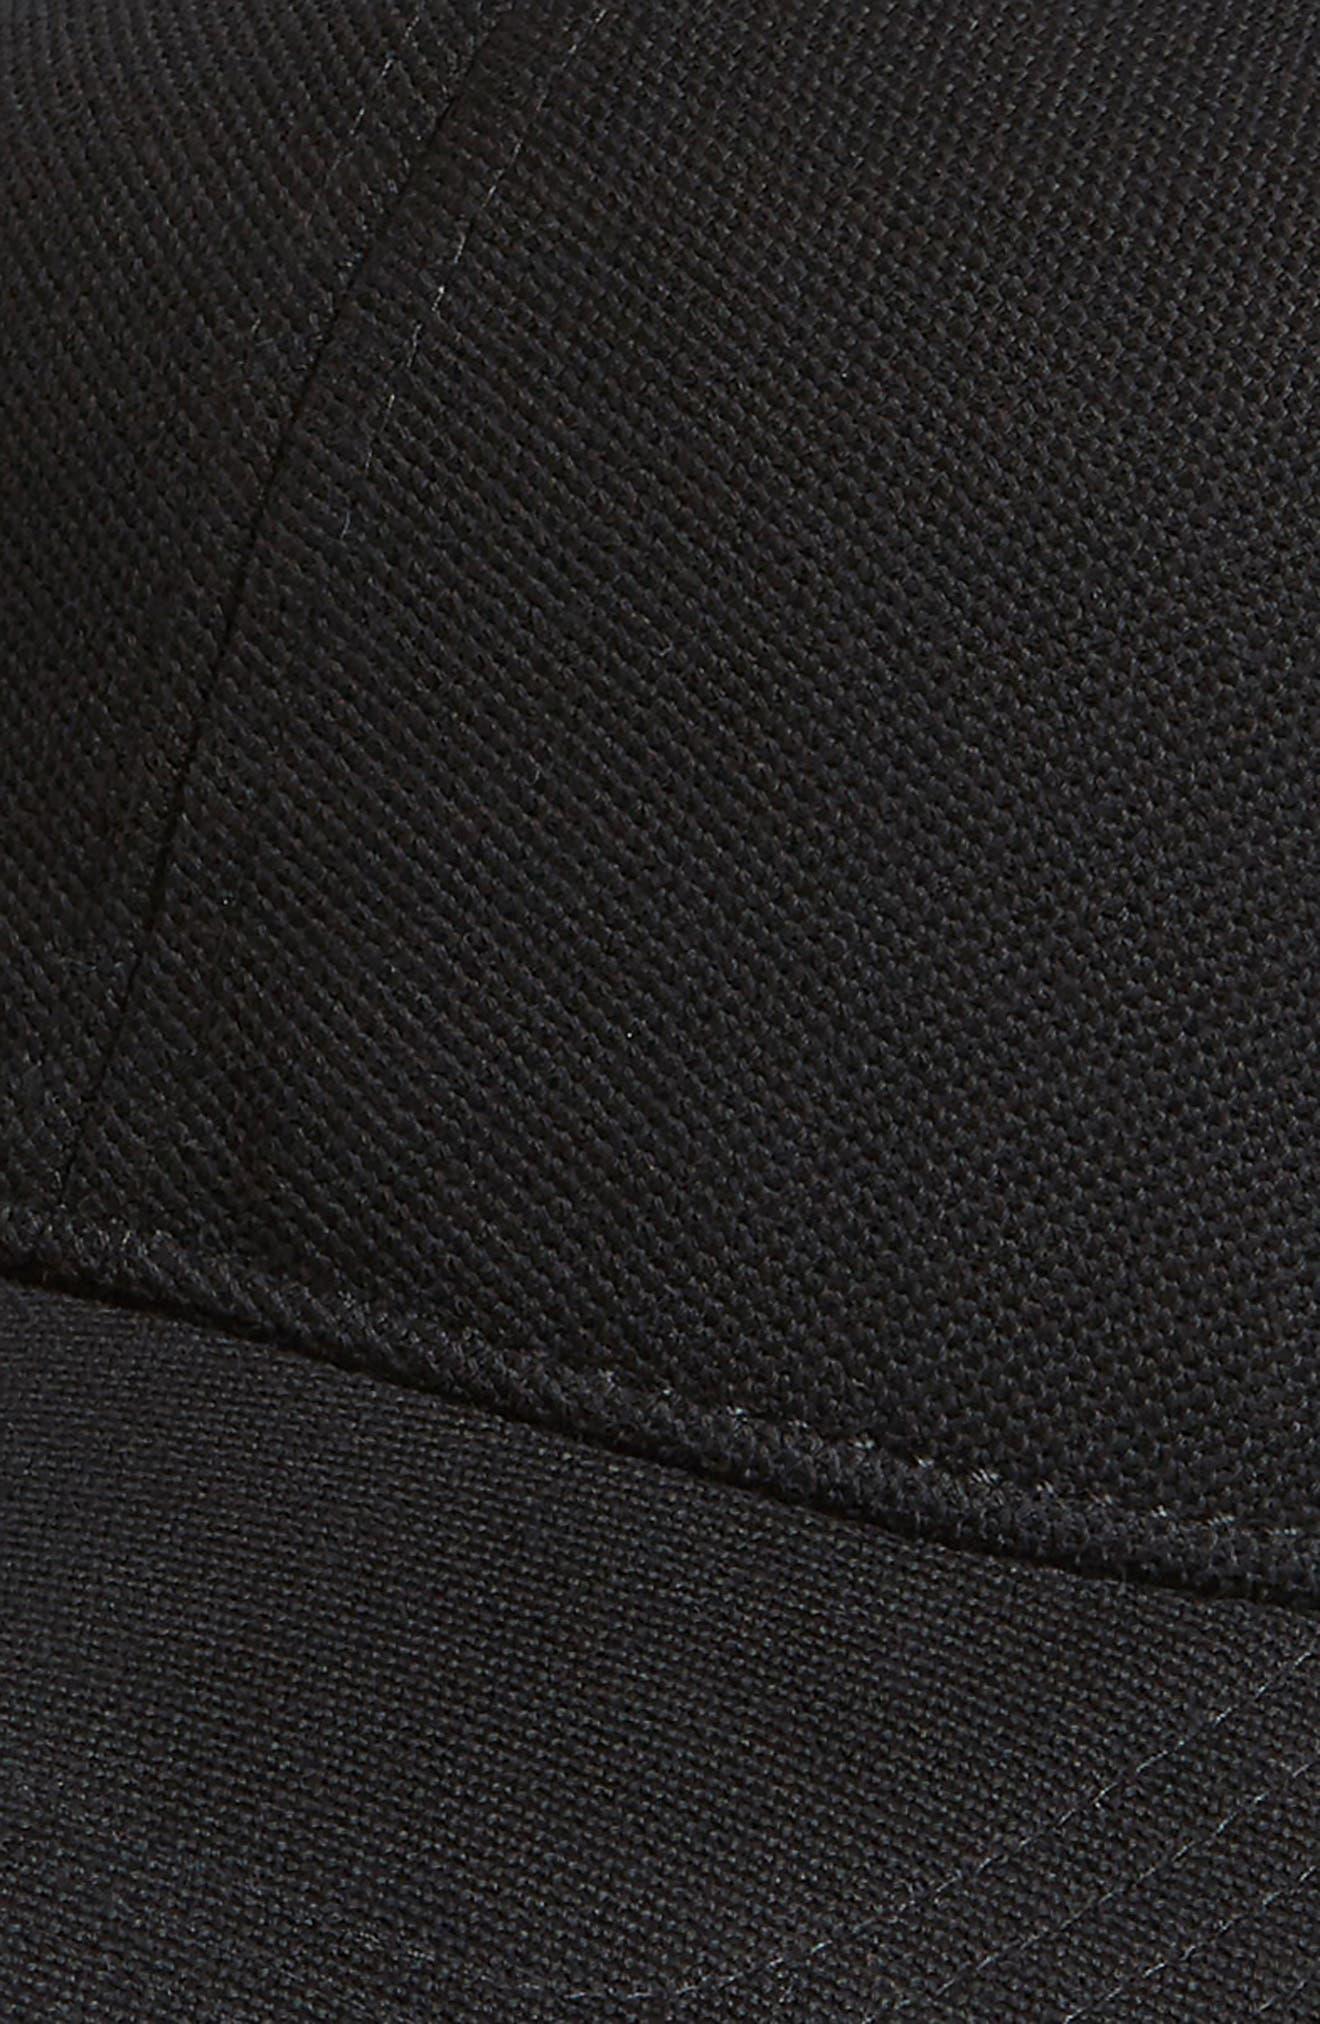 Croc Cotton Baseball Cap,                             Alternate thumbnail 3, color,                             Black